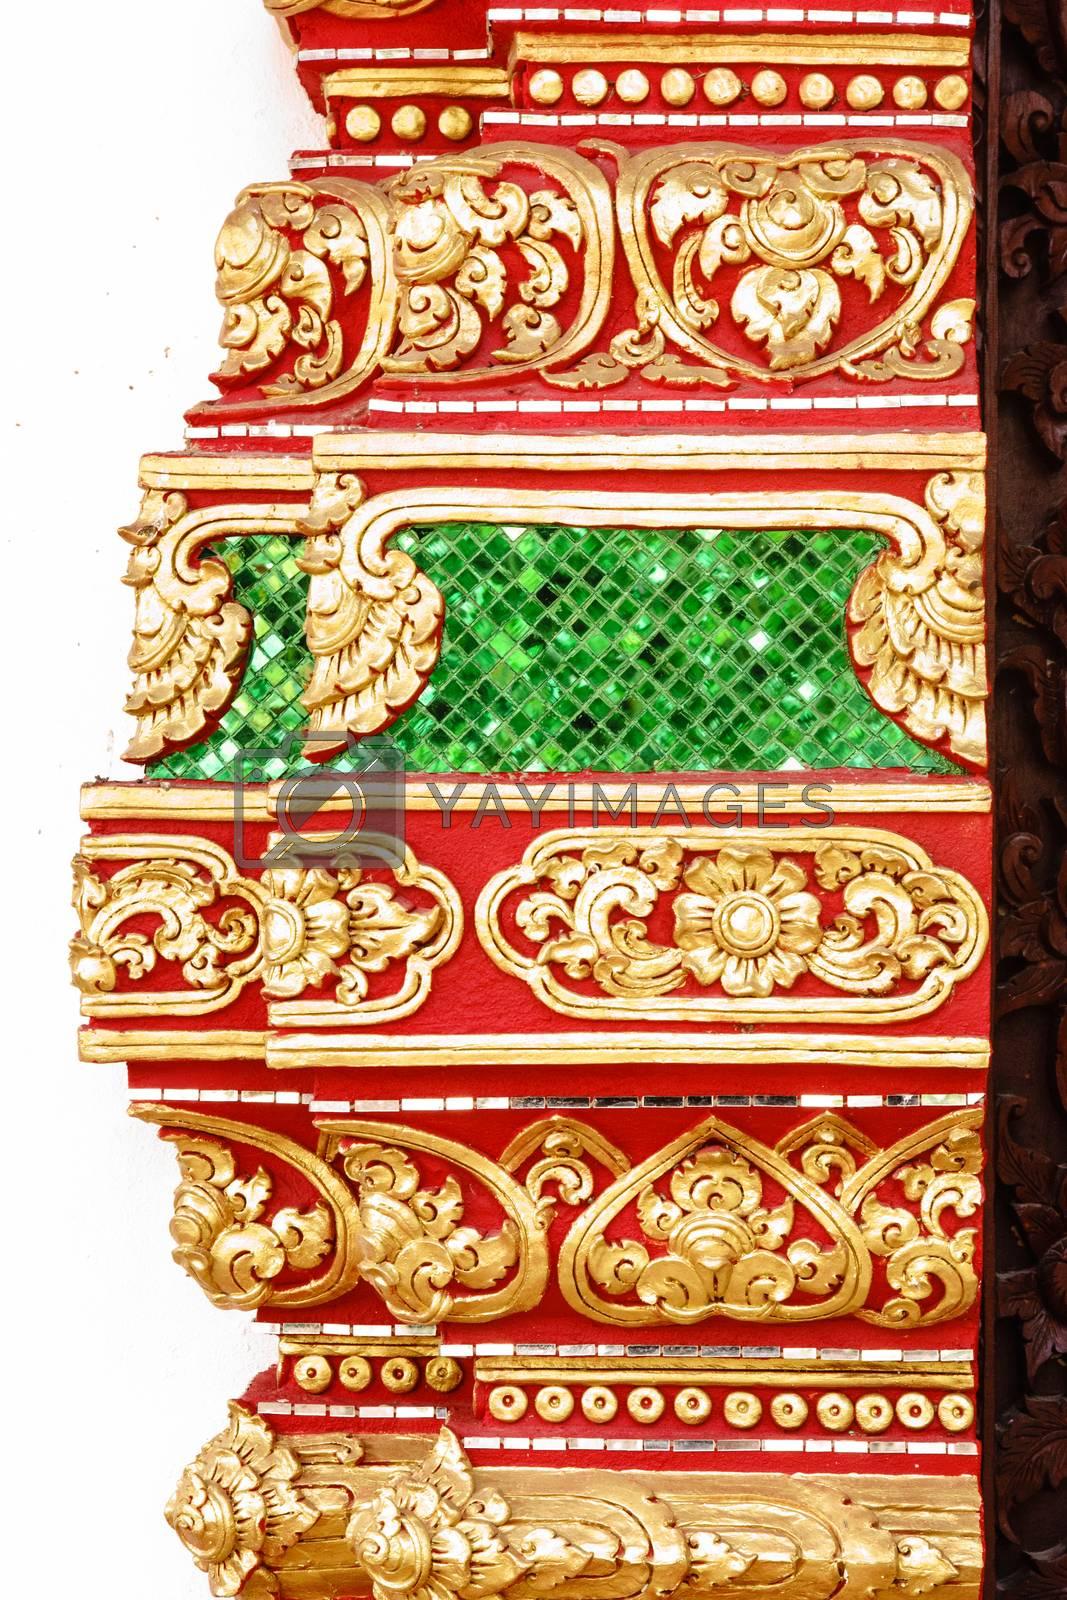 Royalty free image of thai art by nattapatt